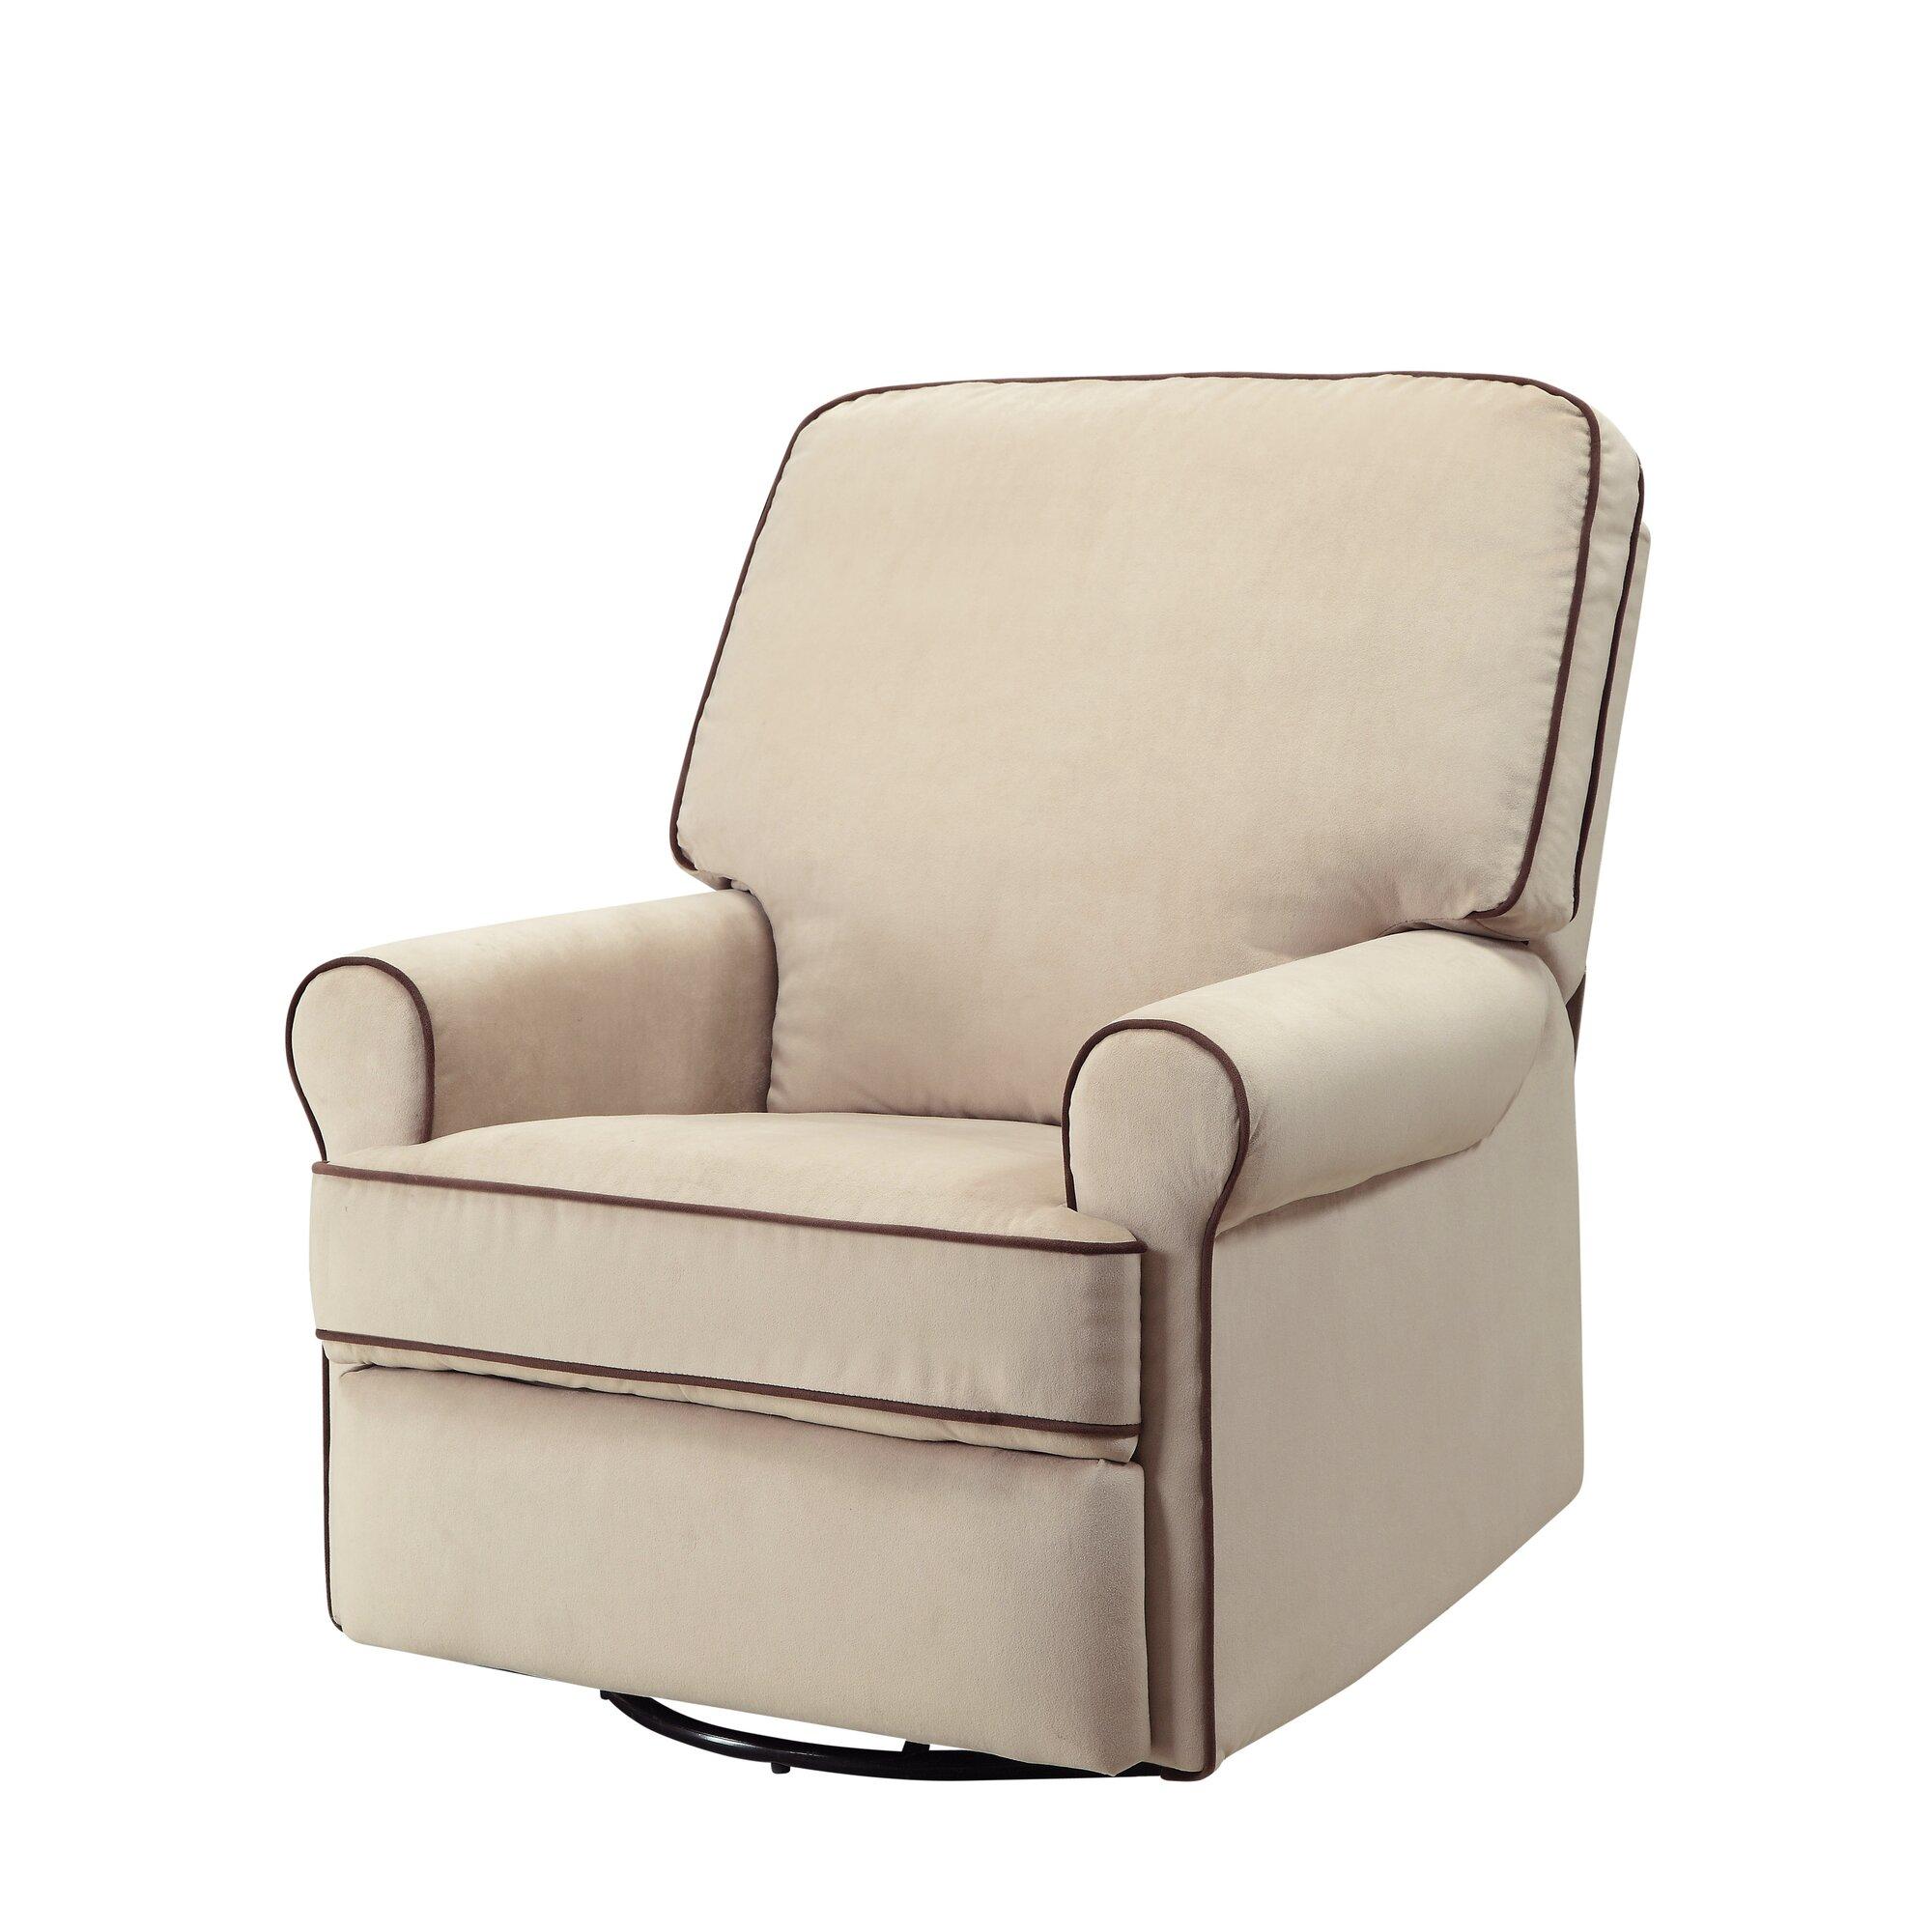 tarik swivel reclining glider - Reclining Glider